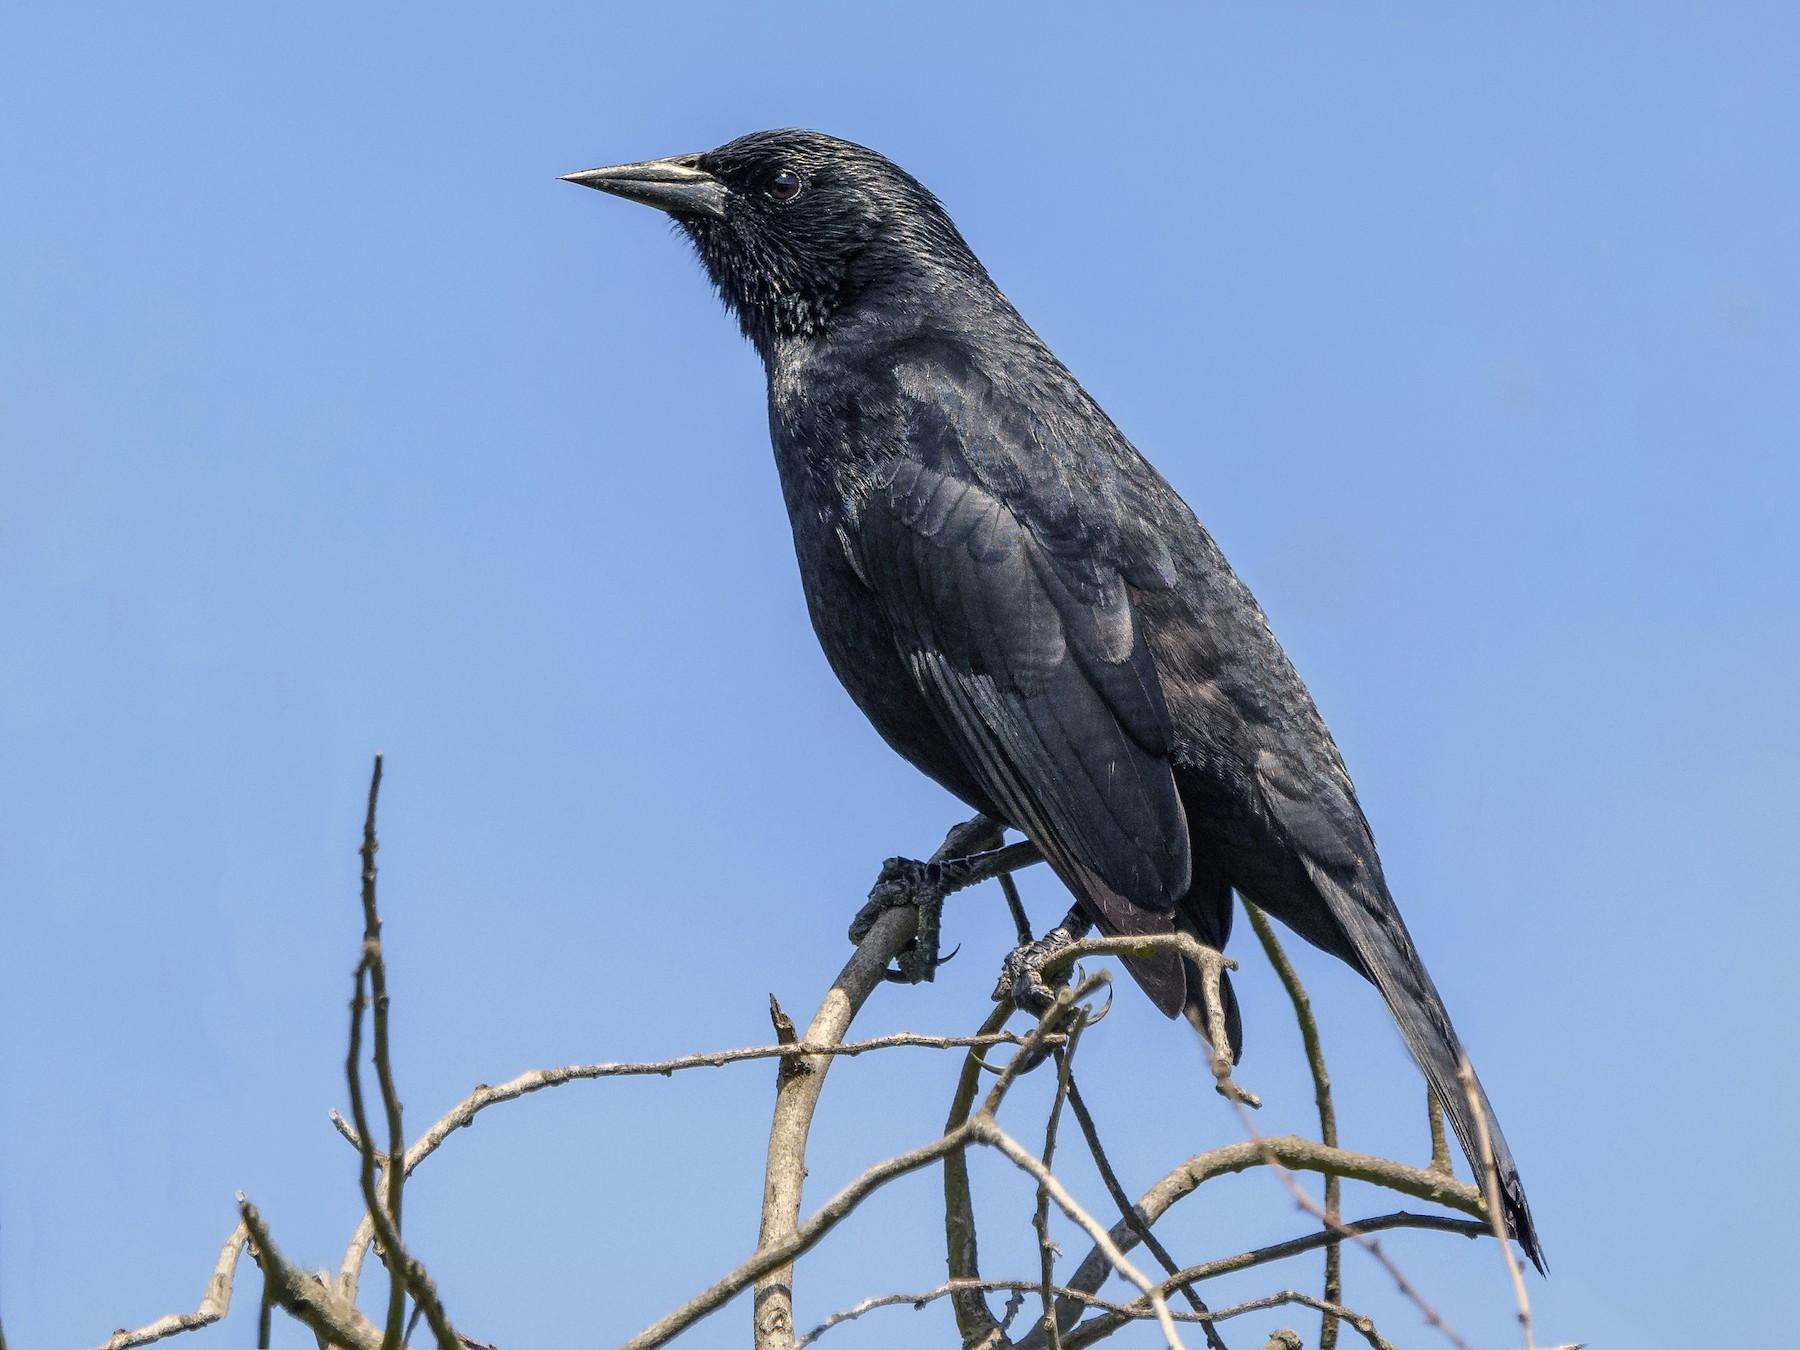 Austral Blackbird - VERONICA ARAYA GARCIA